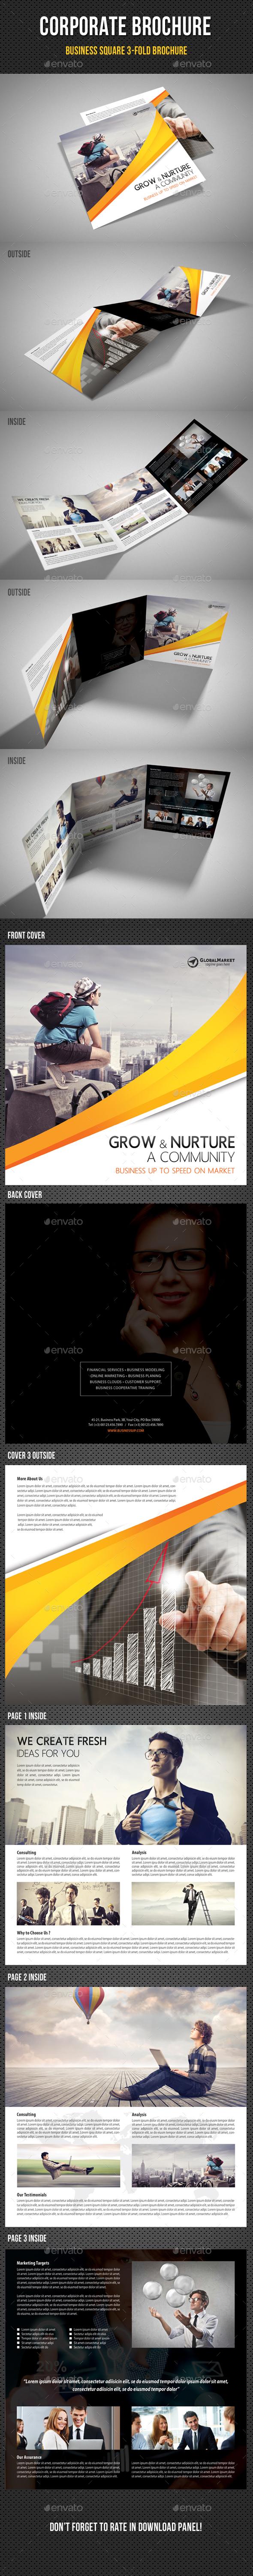 Corporate Business Square 3-Fold Brochure V05 - Corporate Brochures